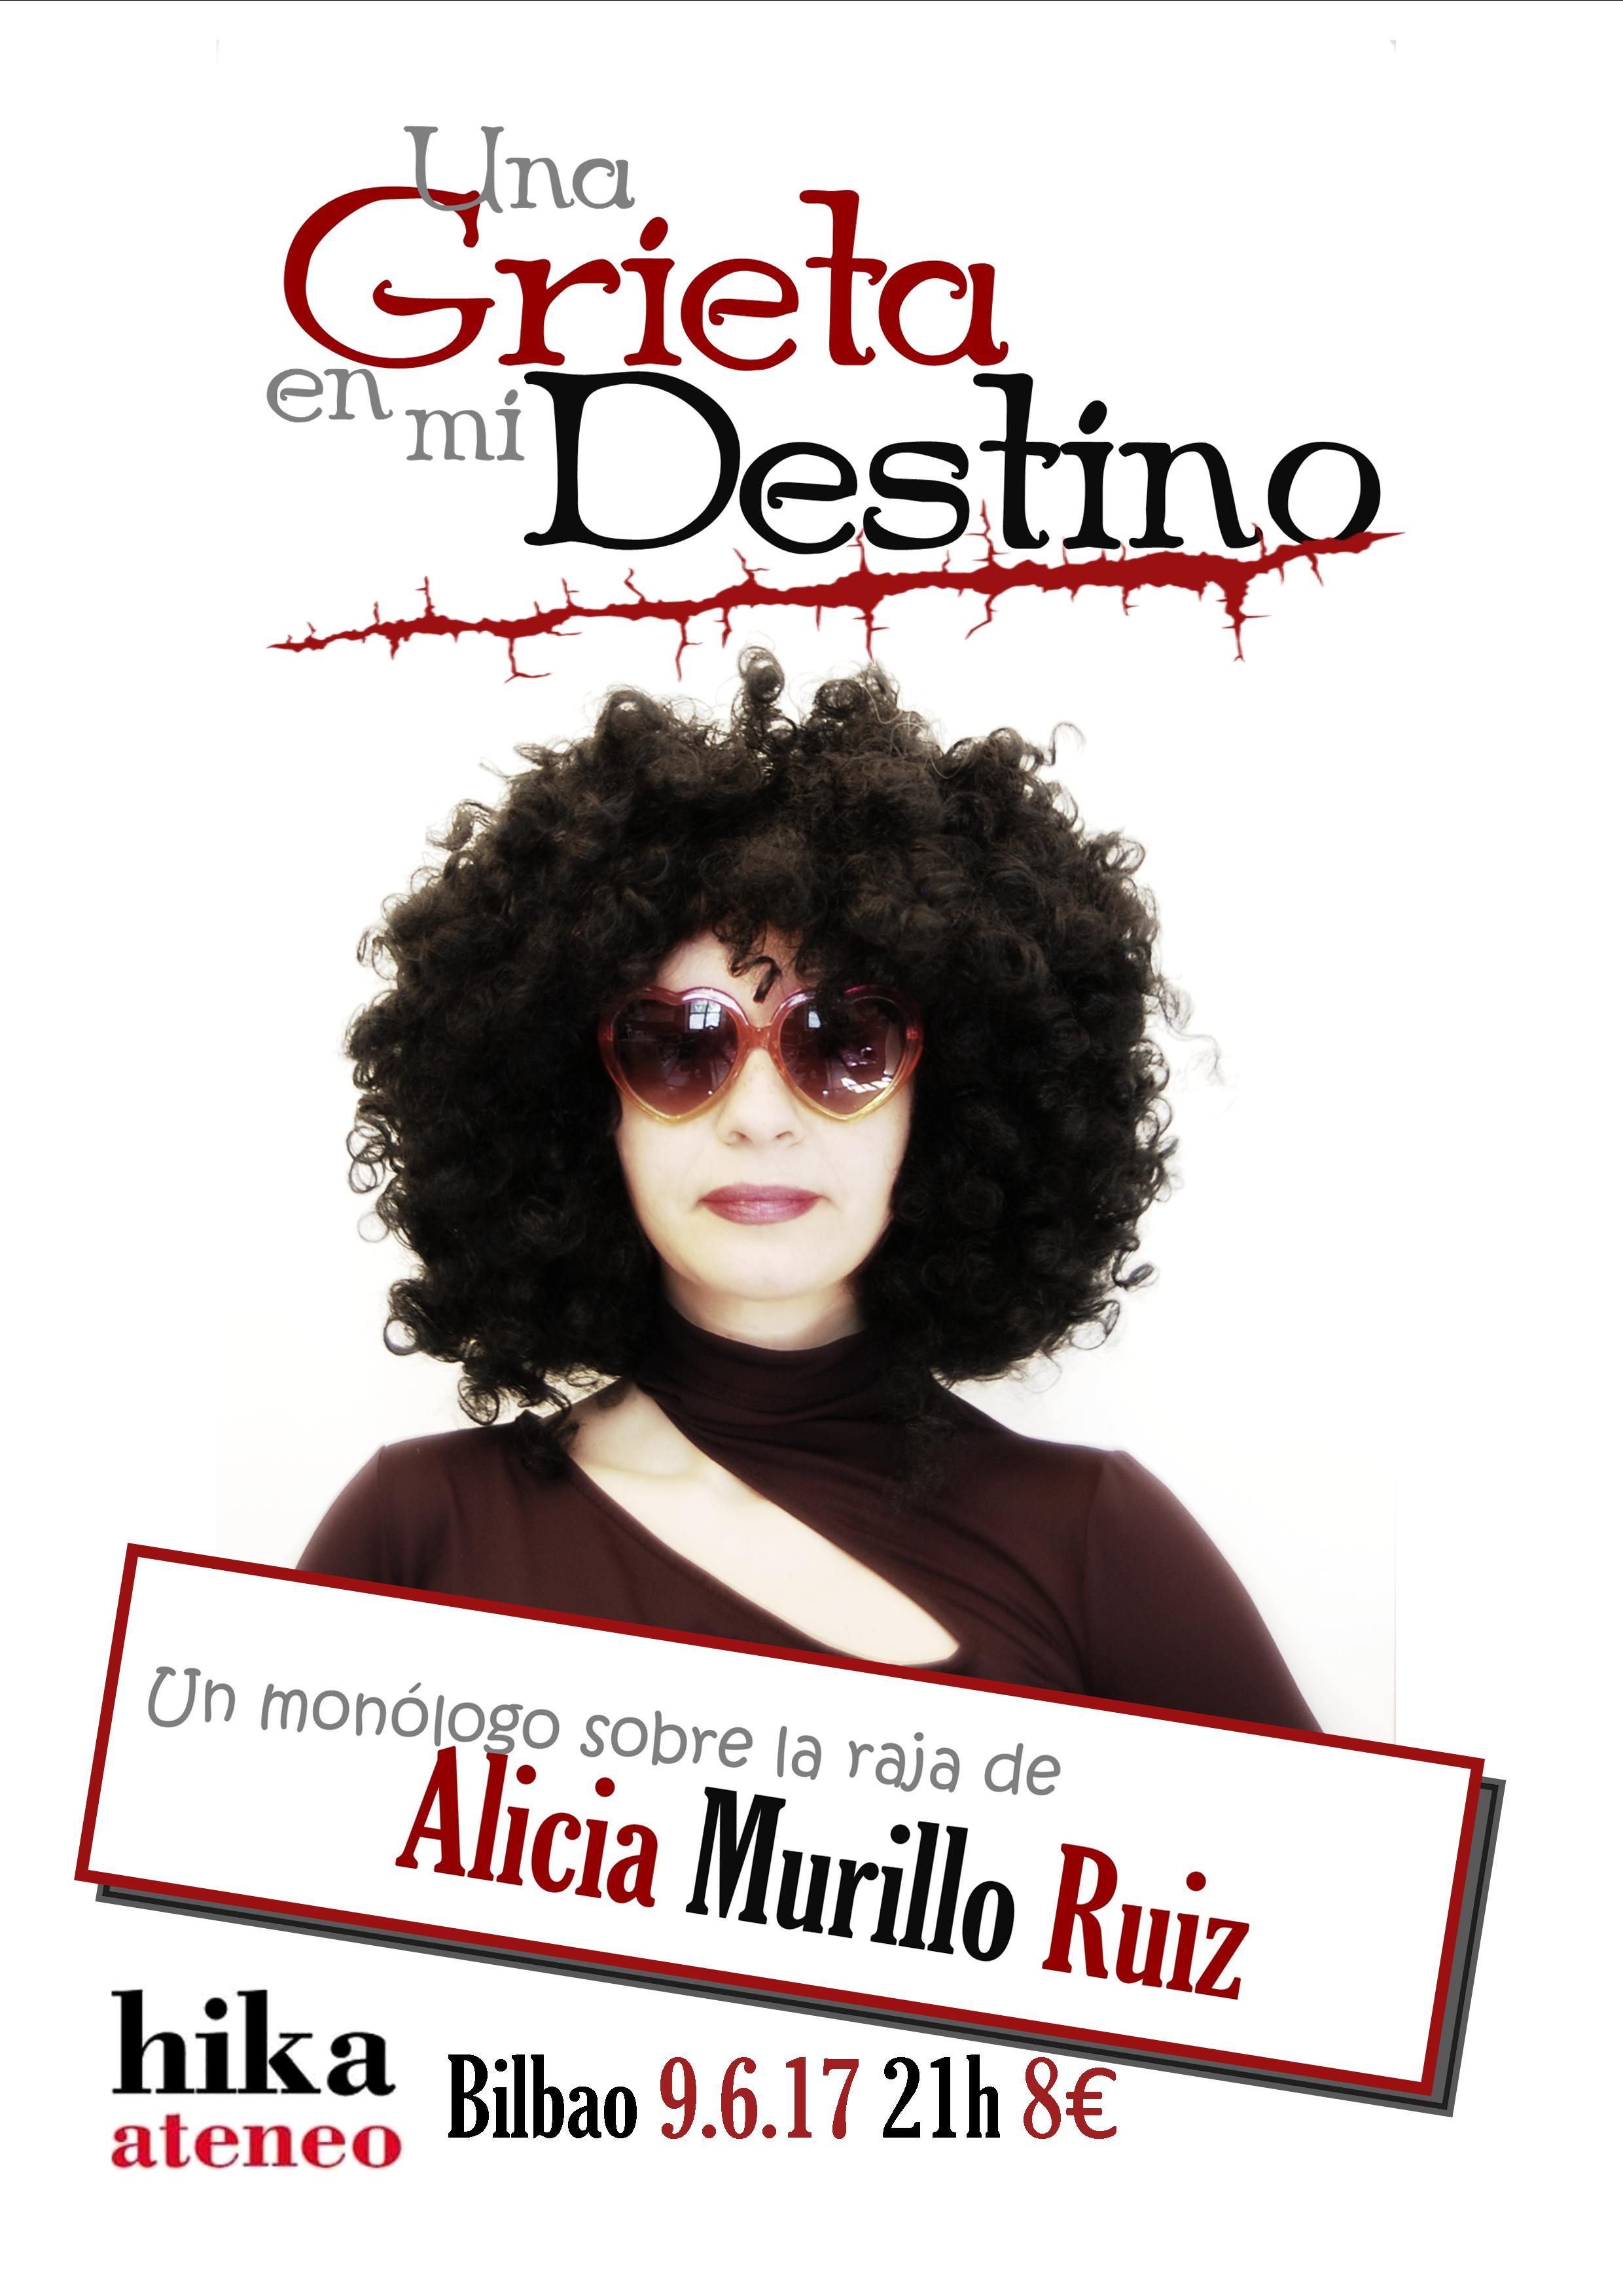 Alicia Murillo hika bilbao